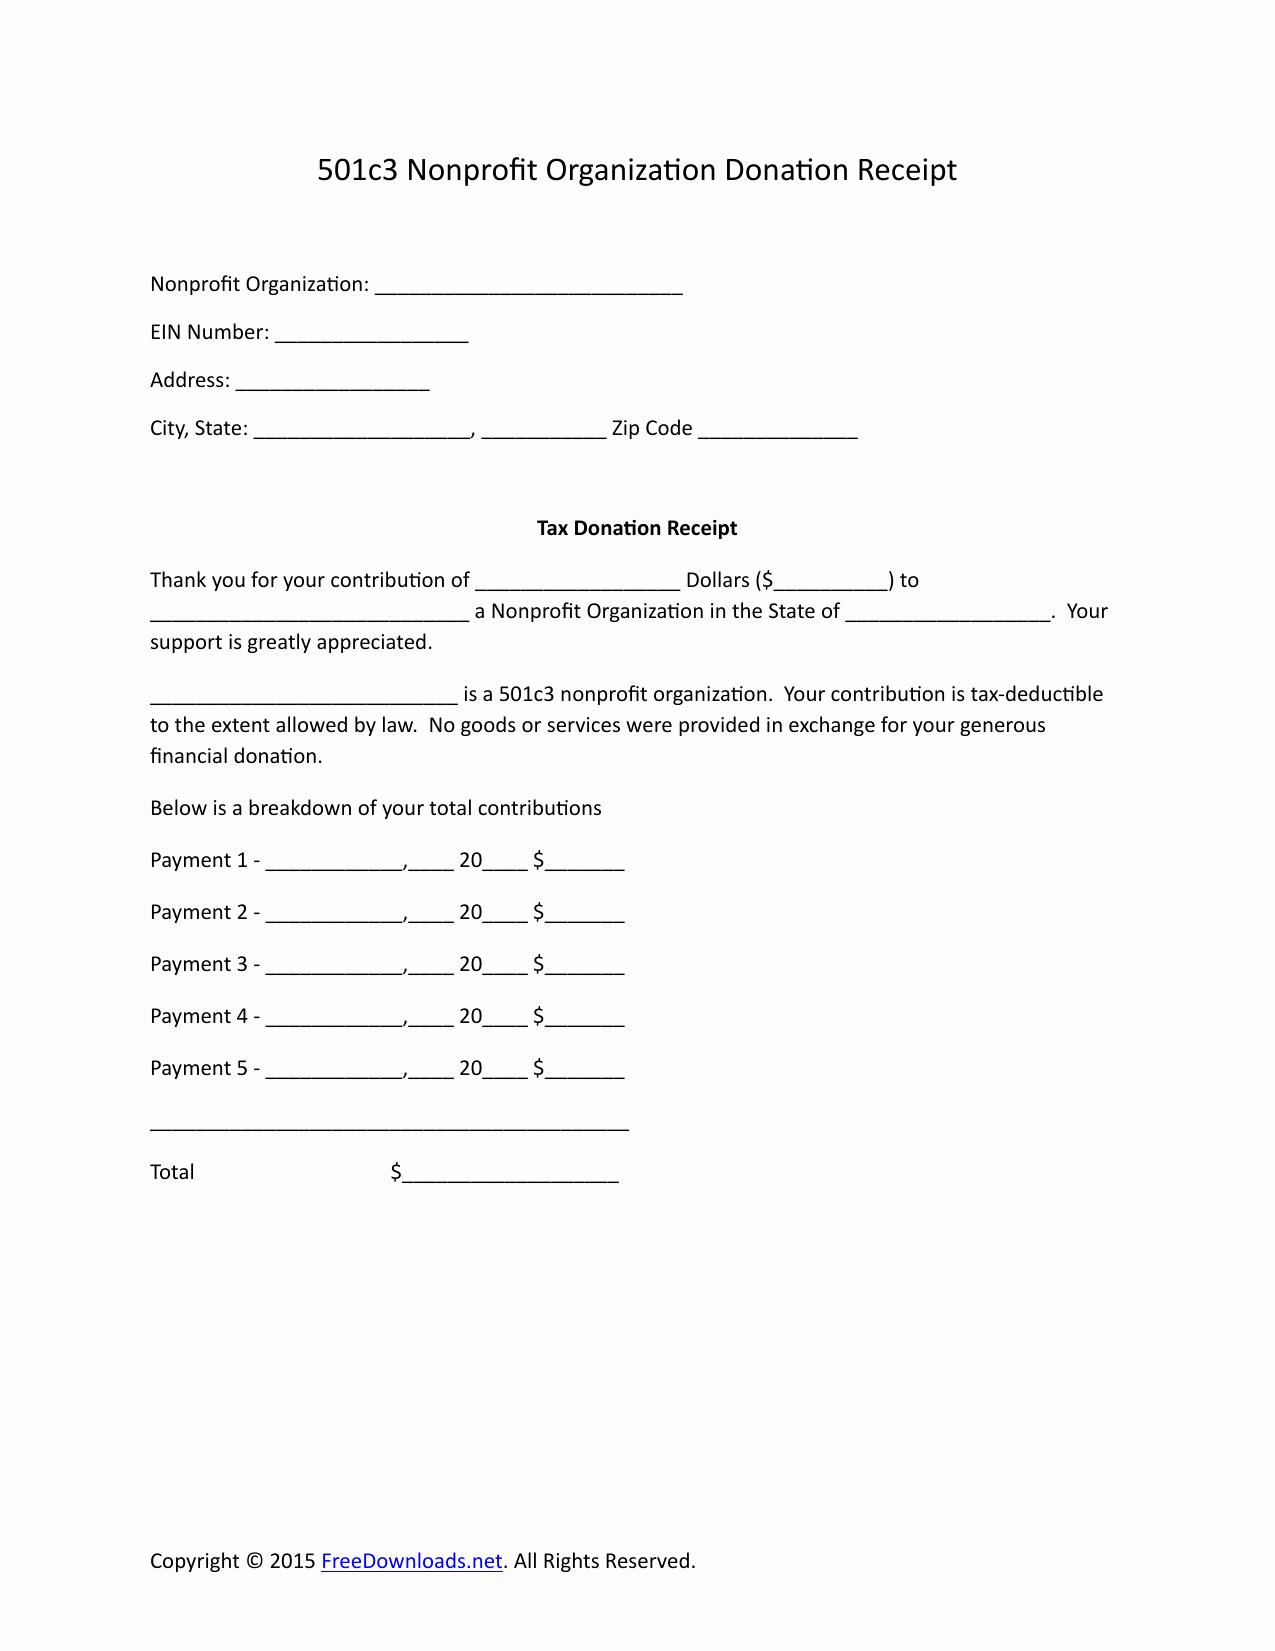 Tax Deductible Donation Receipt Template Unique Download 501c3 Donation Receipt Letter for Tax Purposes